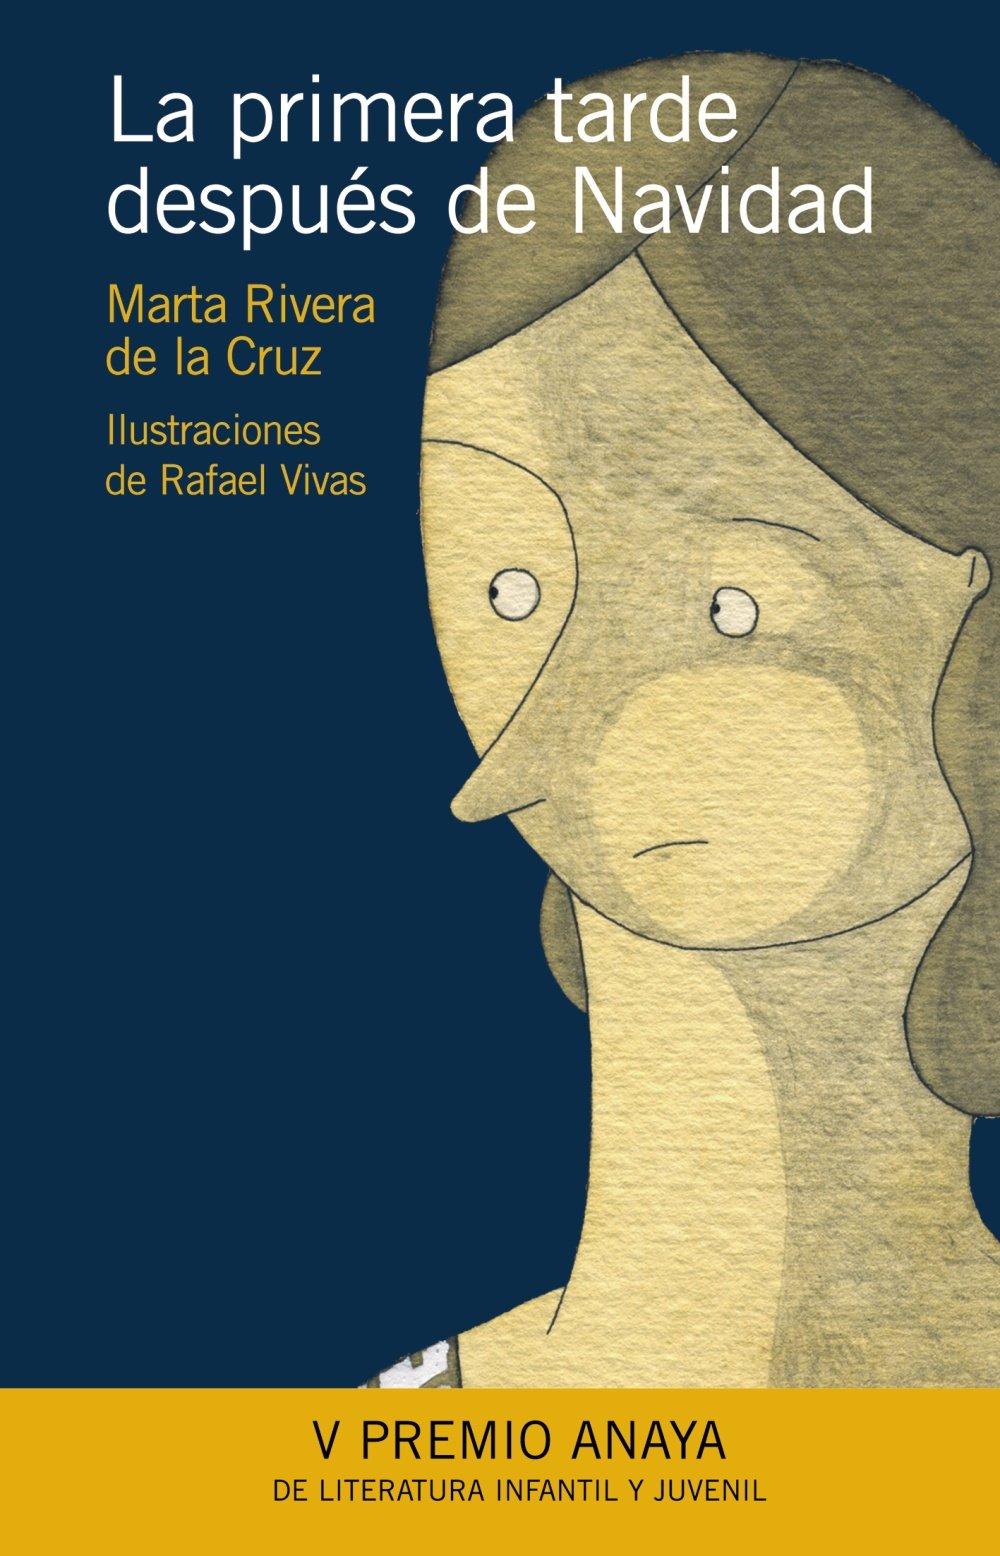 La primera tarde después de Navidad (Literatura Infantil (6-11 Años) - Premio Anaya (Infantil)) Tapa dura – 2 mar 2009 Marta Rivera de la Cruz Rafa Vivas ANAYA INFANTIL Y JUVENIL 8466776818